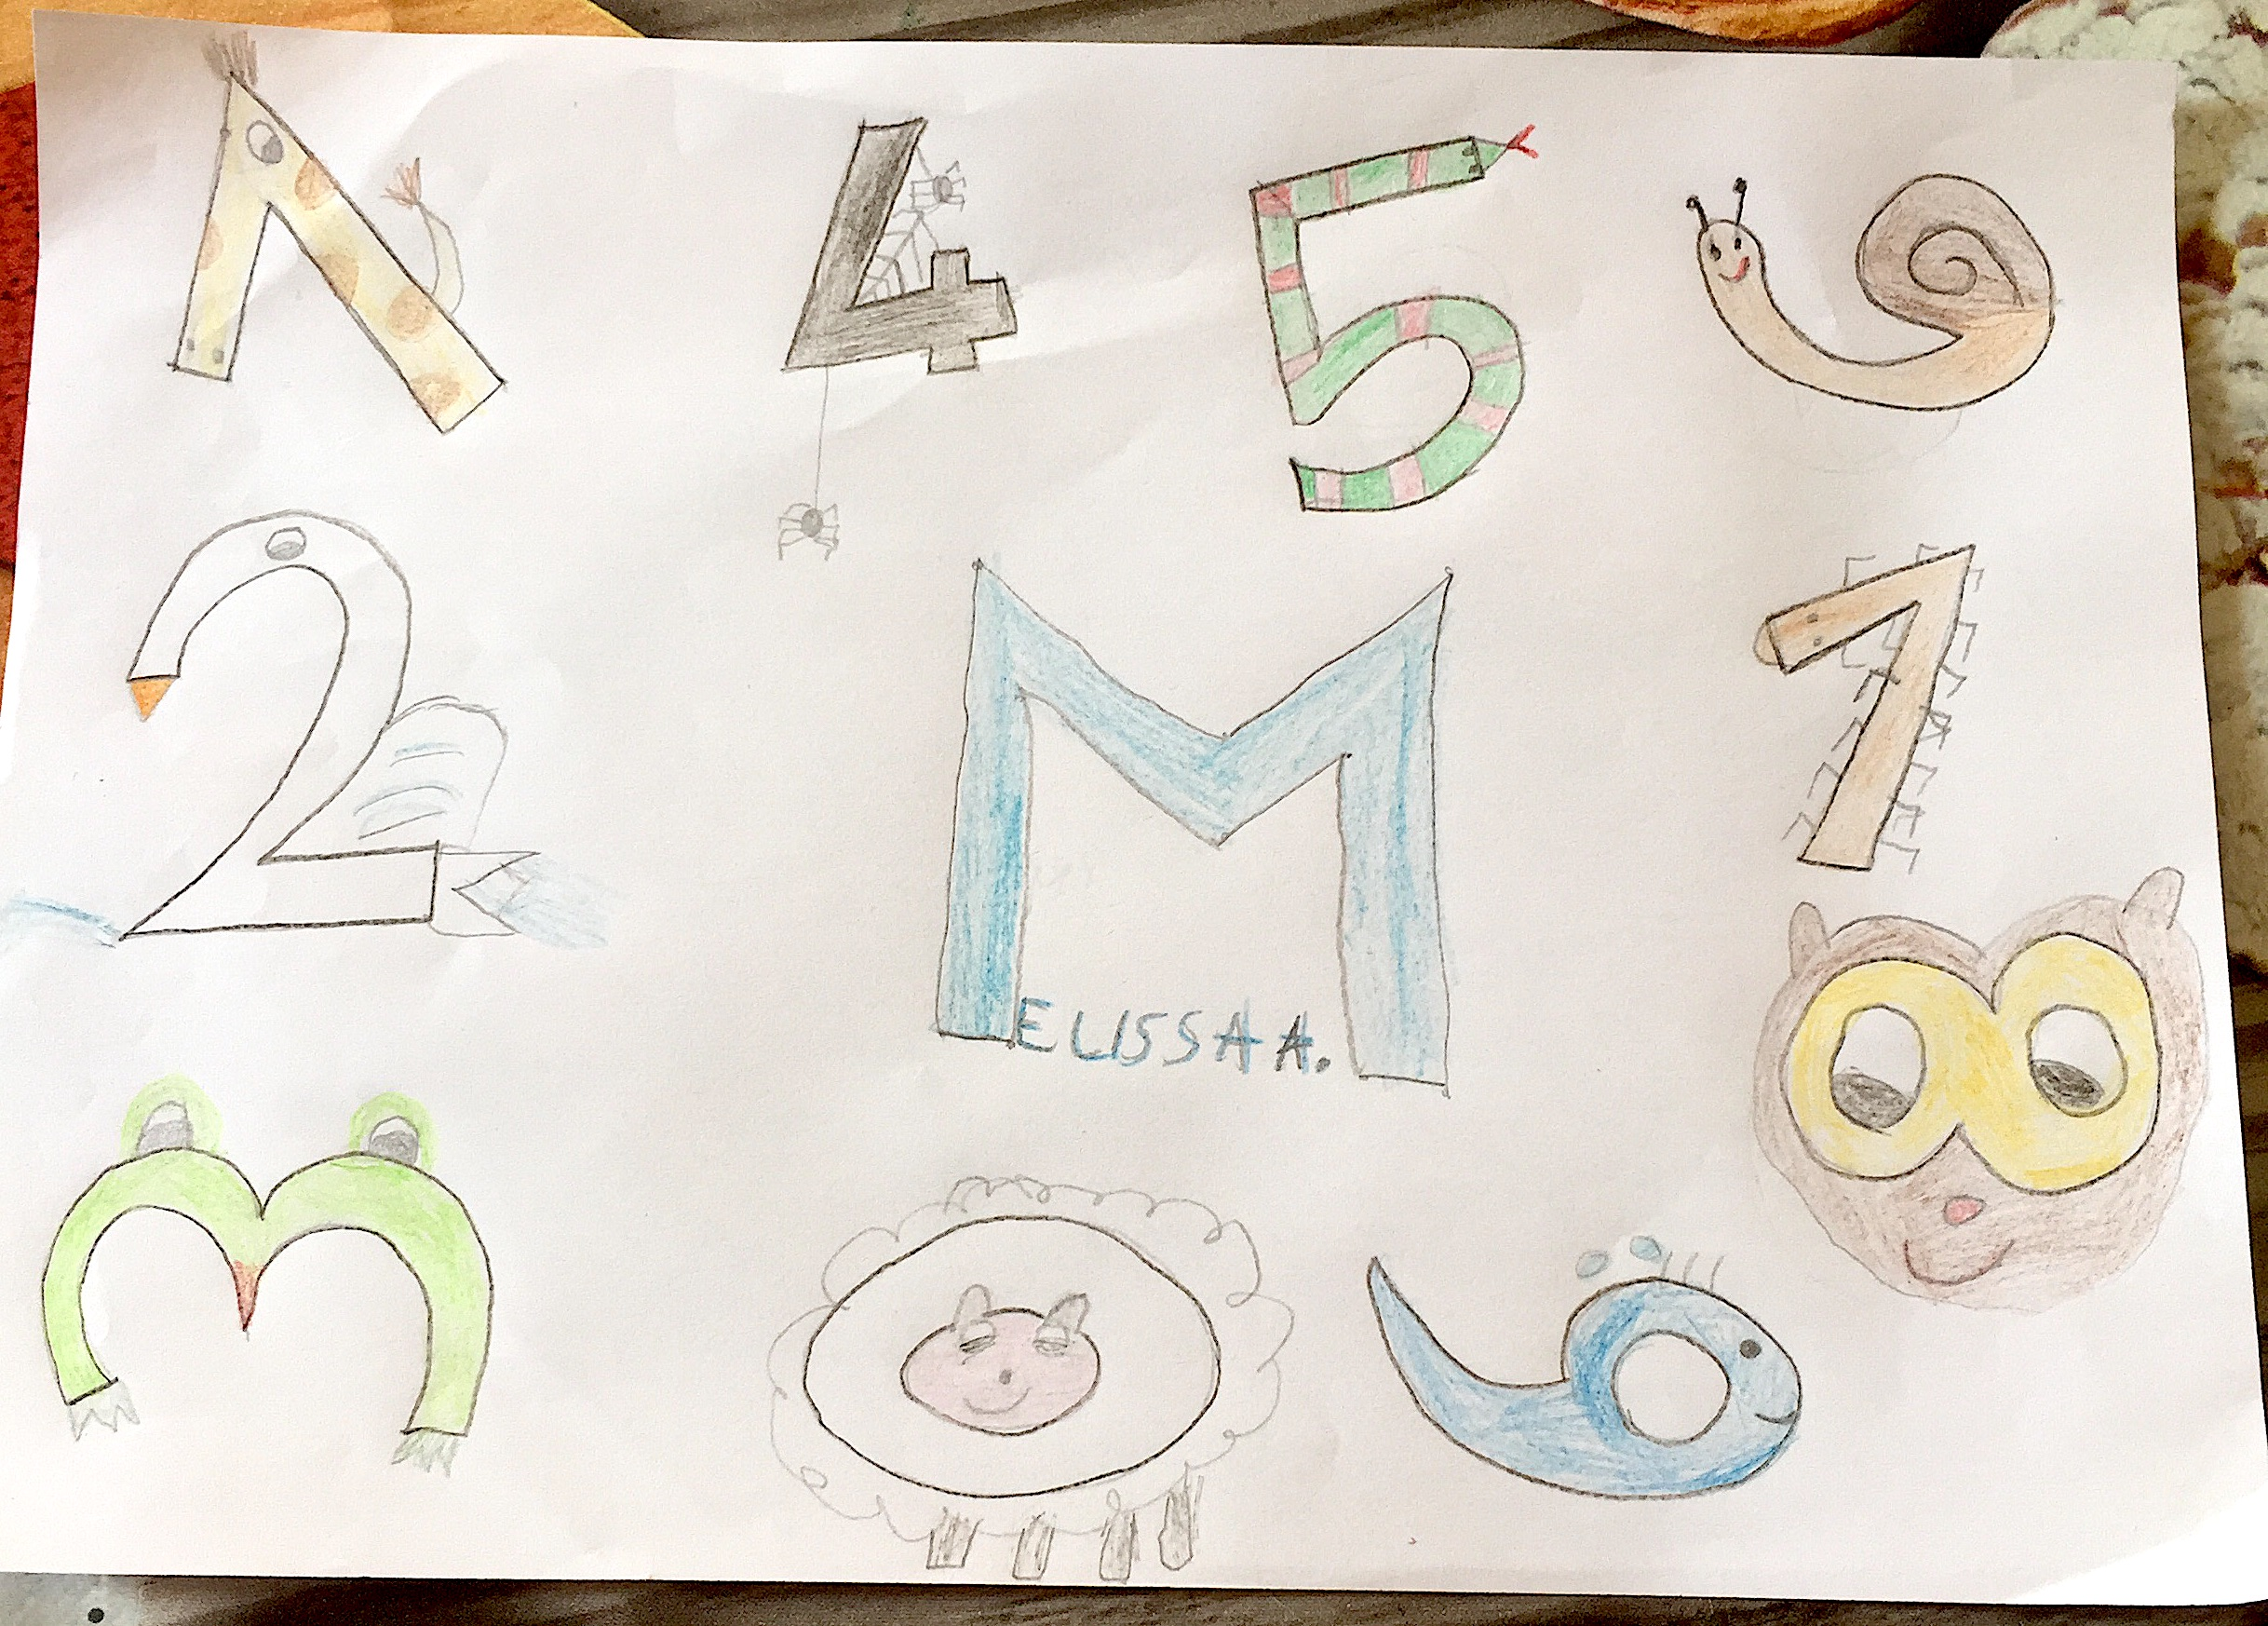 Melissa tra i numeri (Melissa A.)